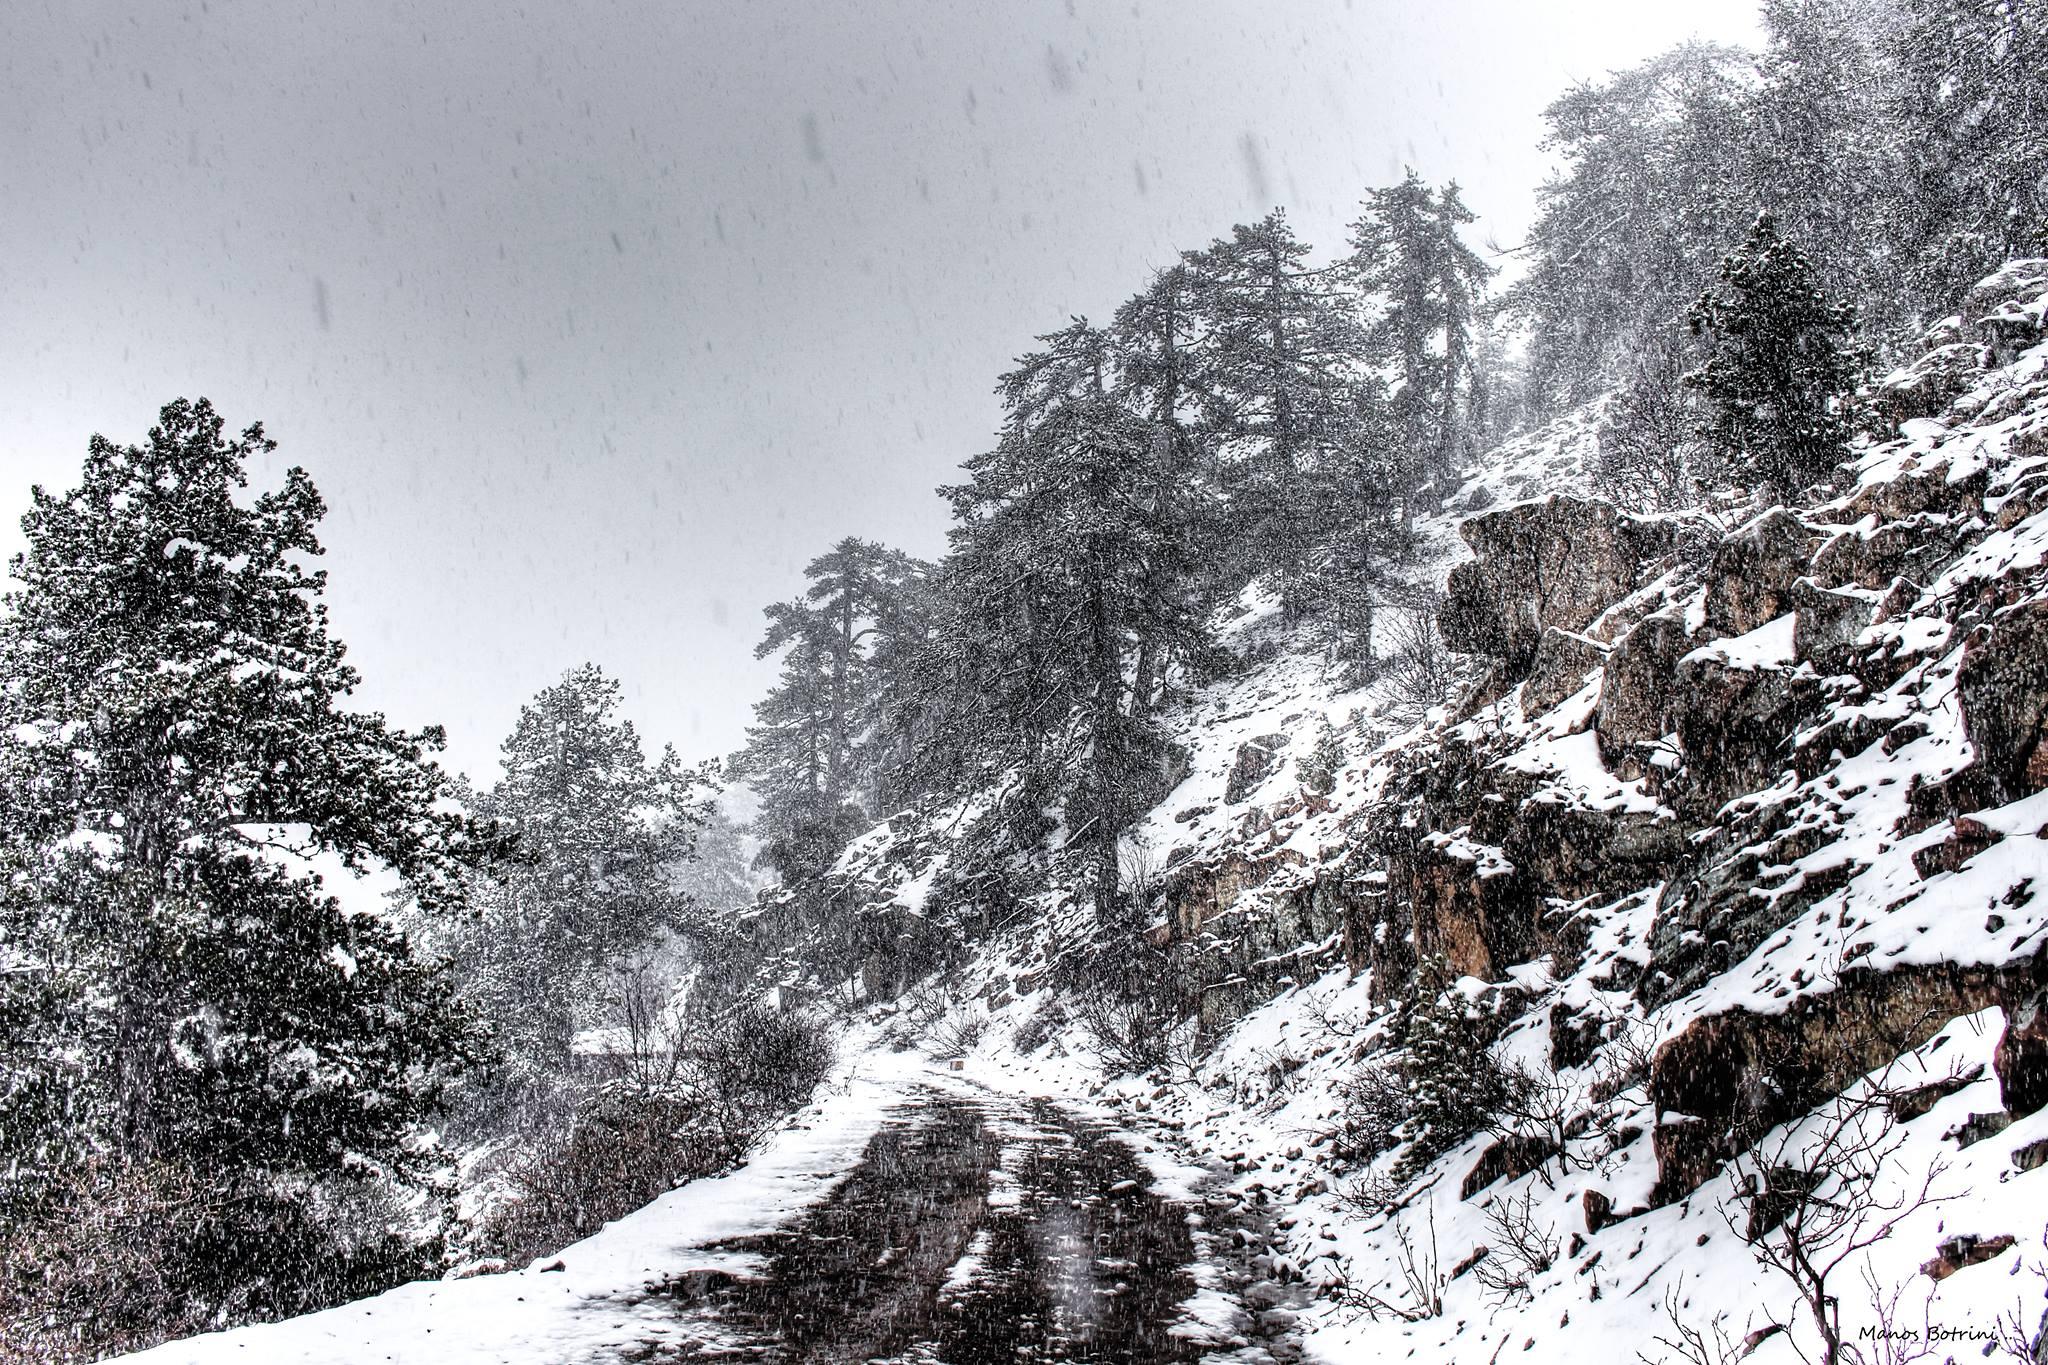 Trodos'tan Kar Manzaraları galerisi resim 6